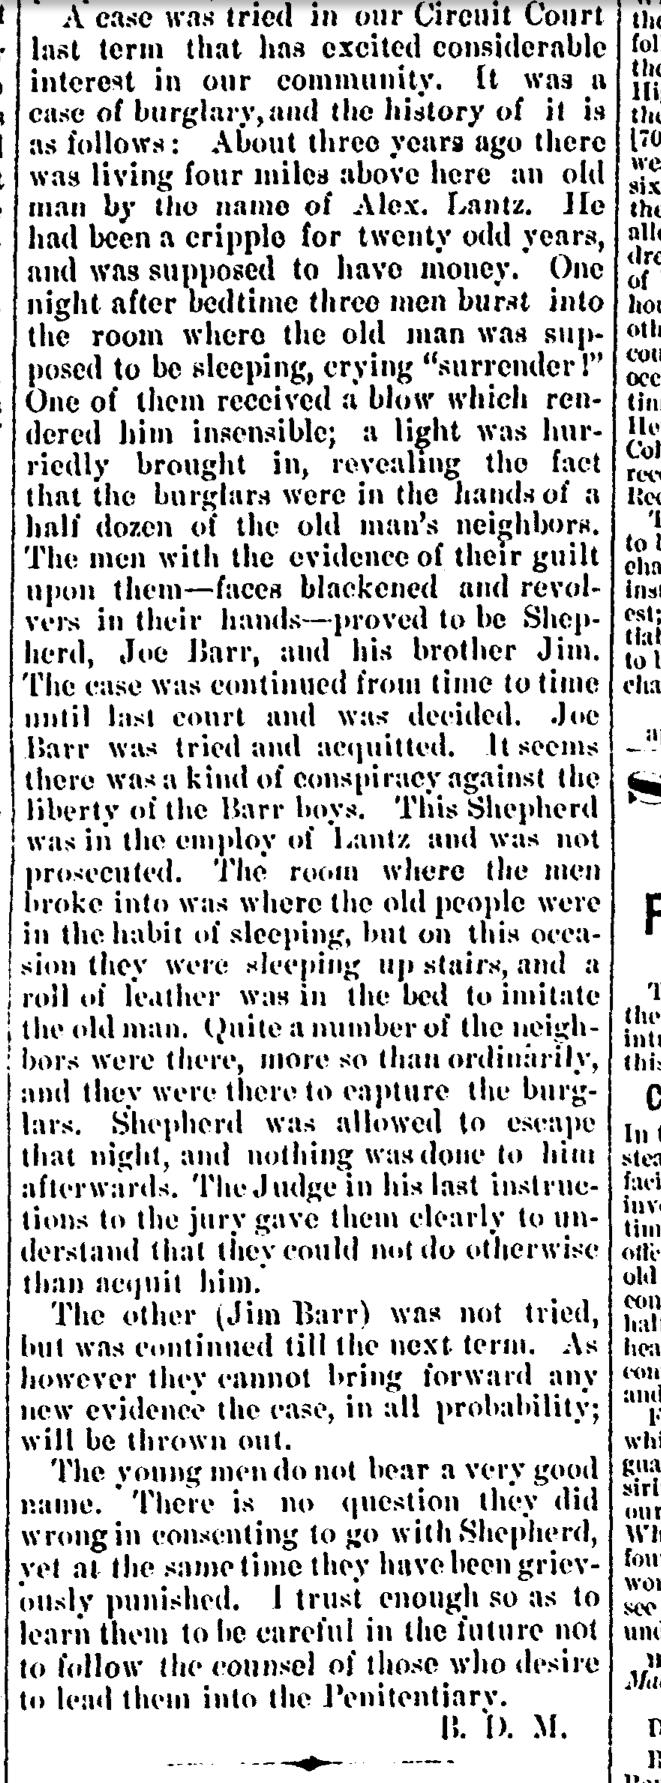 newspaper_lantzalex_1875 copy